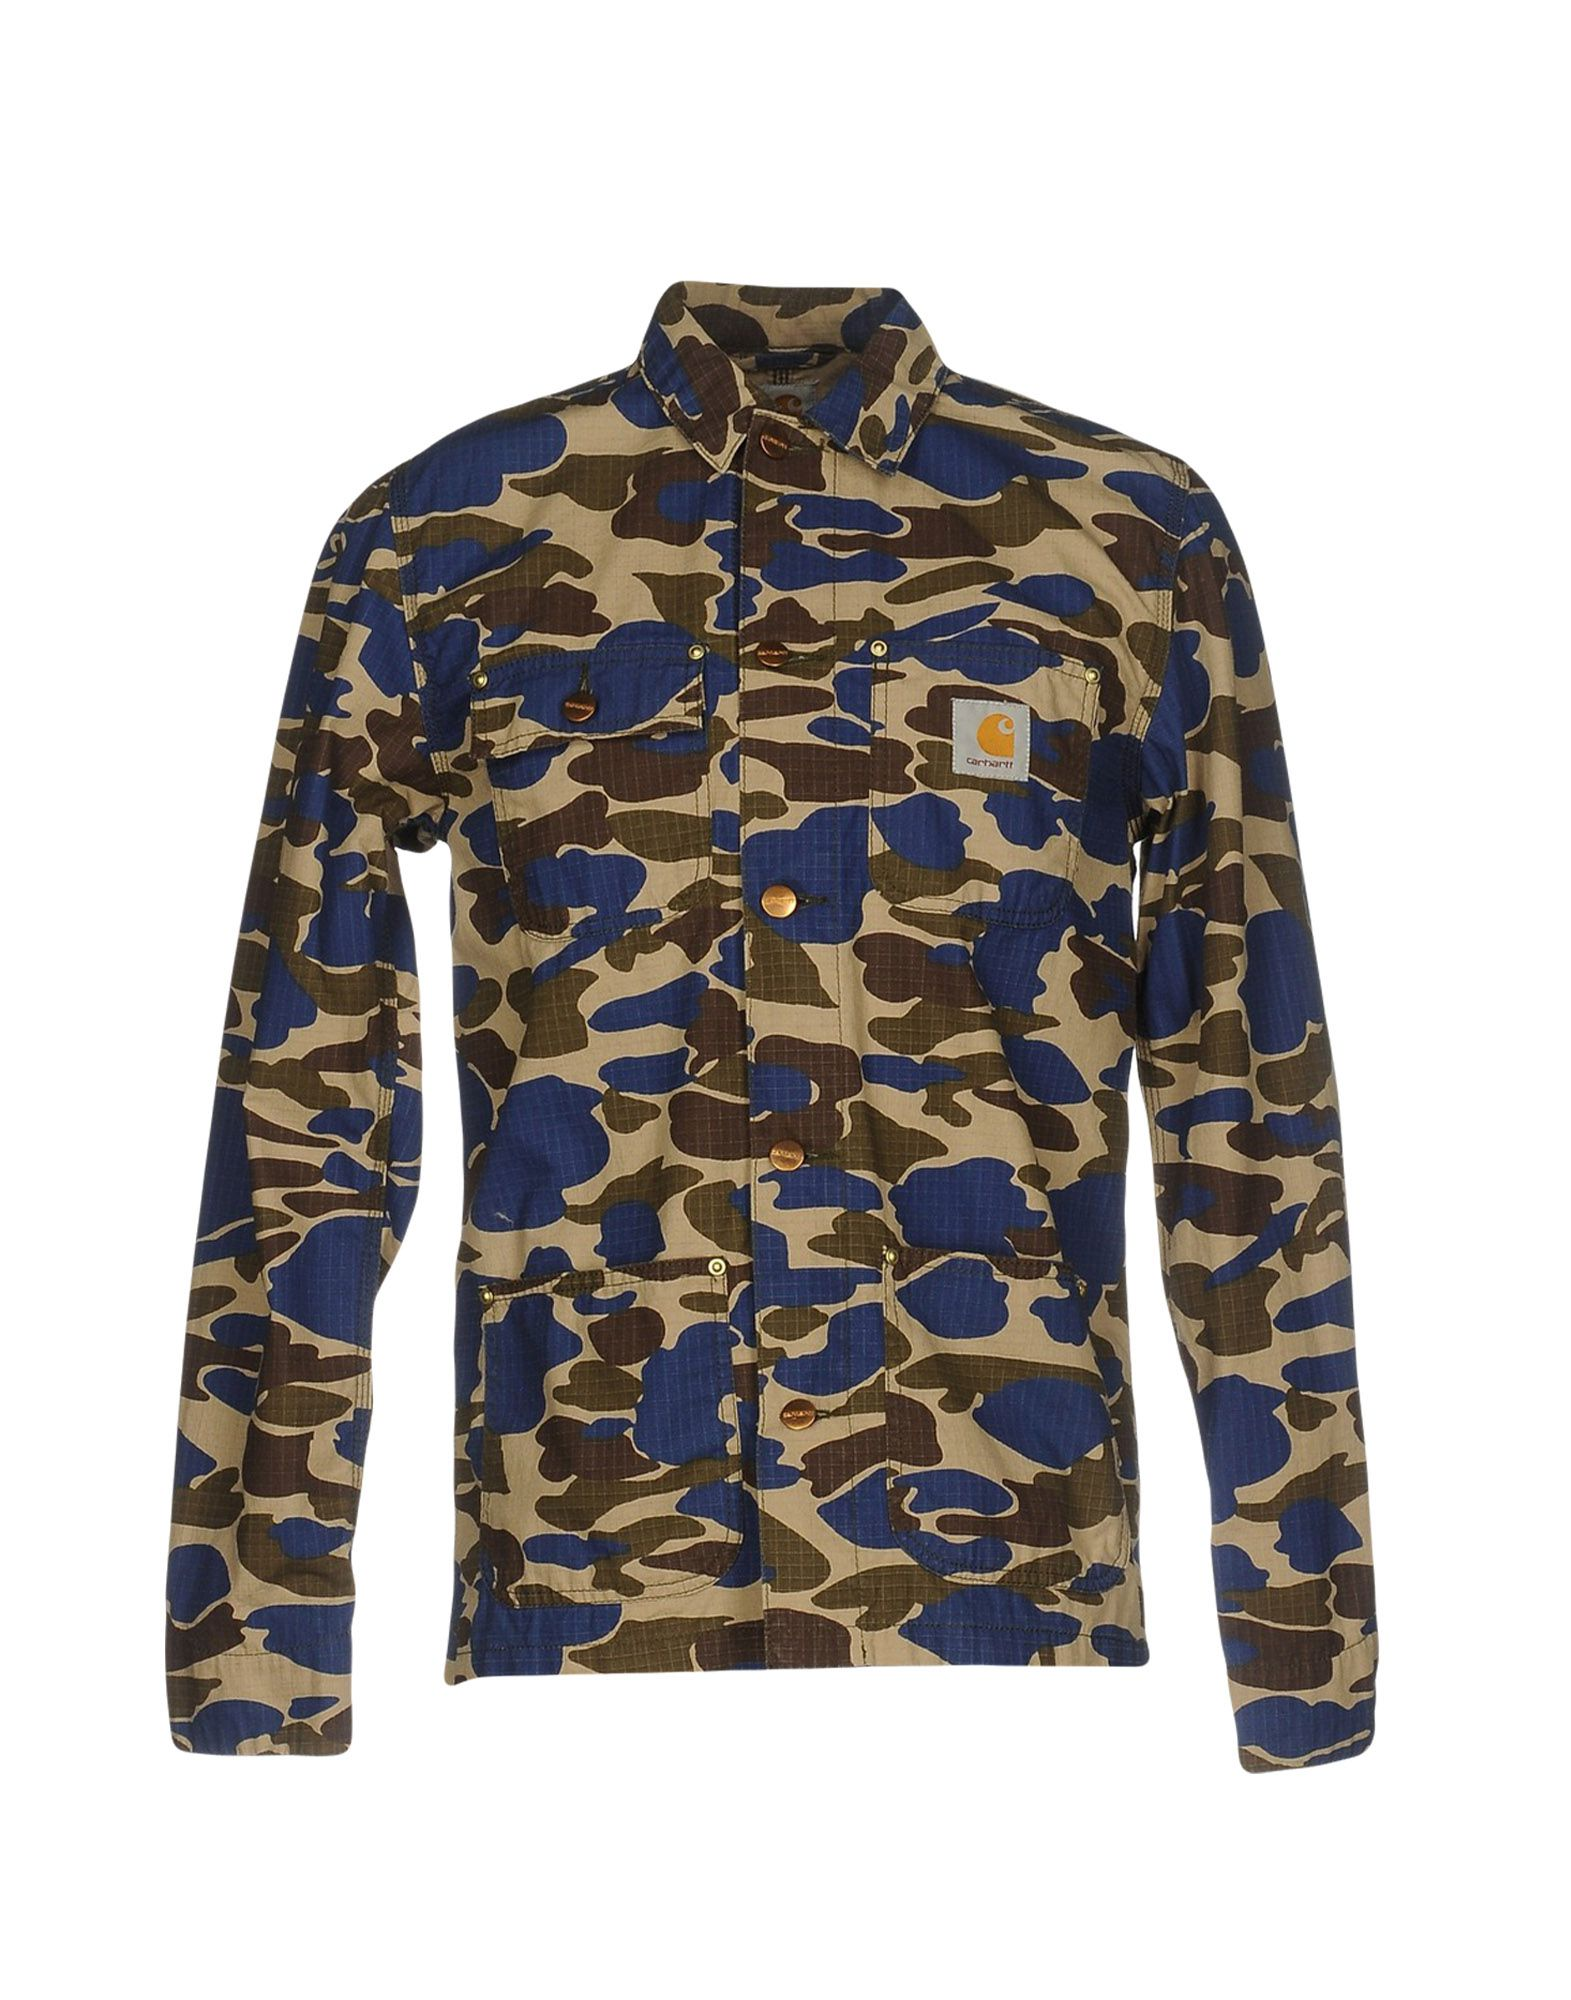 743da290c26 carhartt-nimbus-windbreaker-camo-1130-medium-1 chaqueta carhartt camuflaje